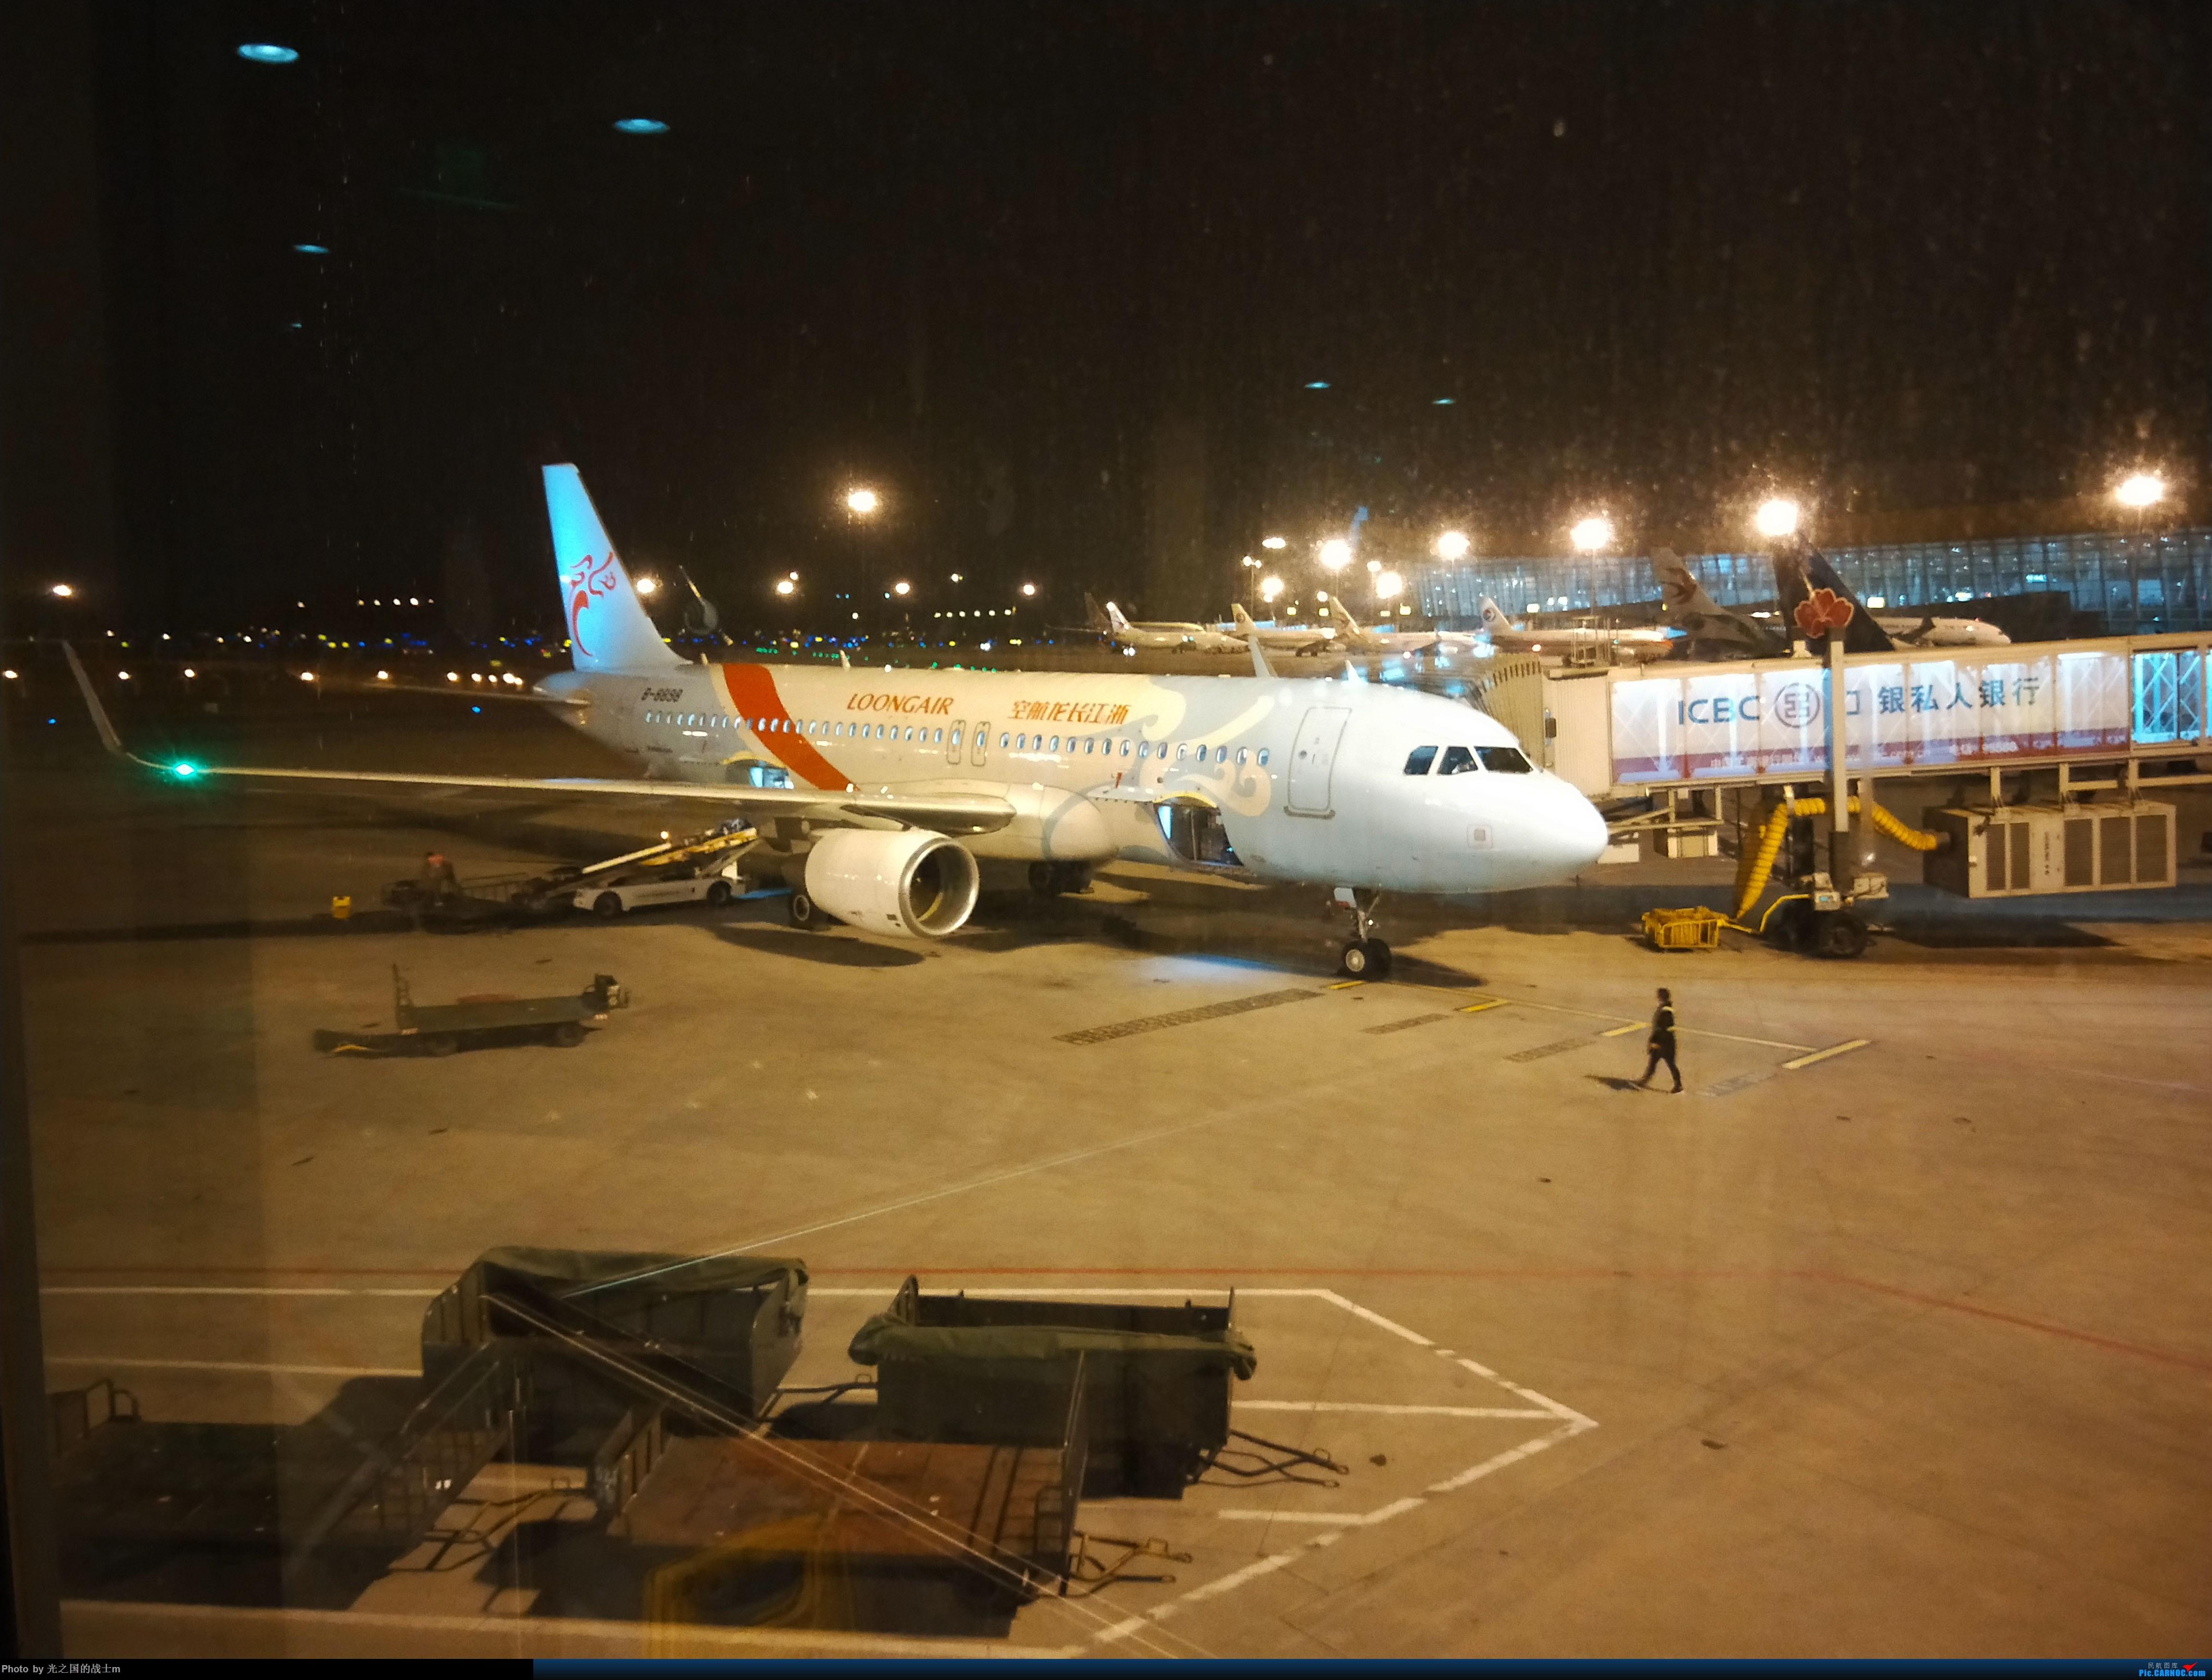 Re:【光之国m游记】由春城飞往极边之城腾冲,体验不一样的短途航线 AIRBUS A320